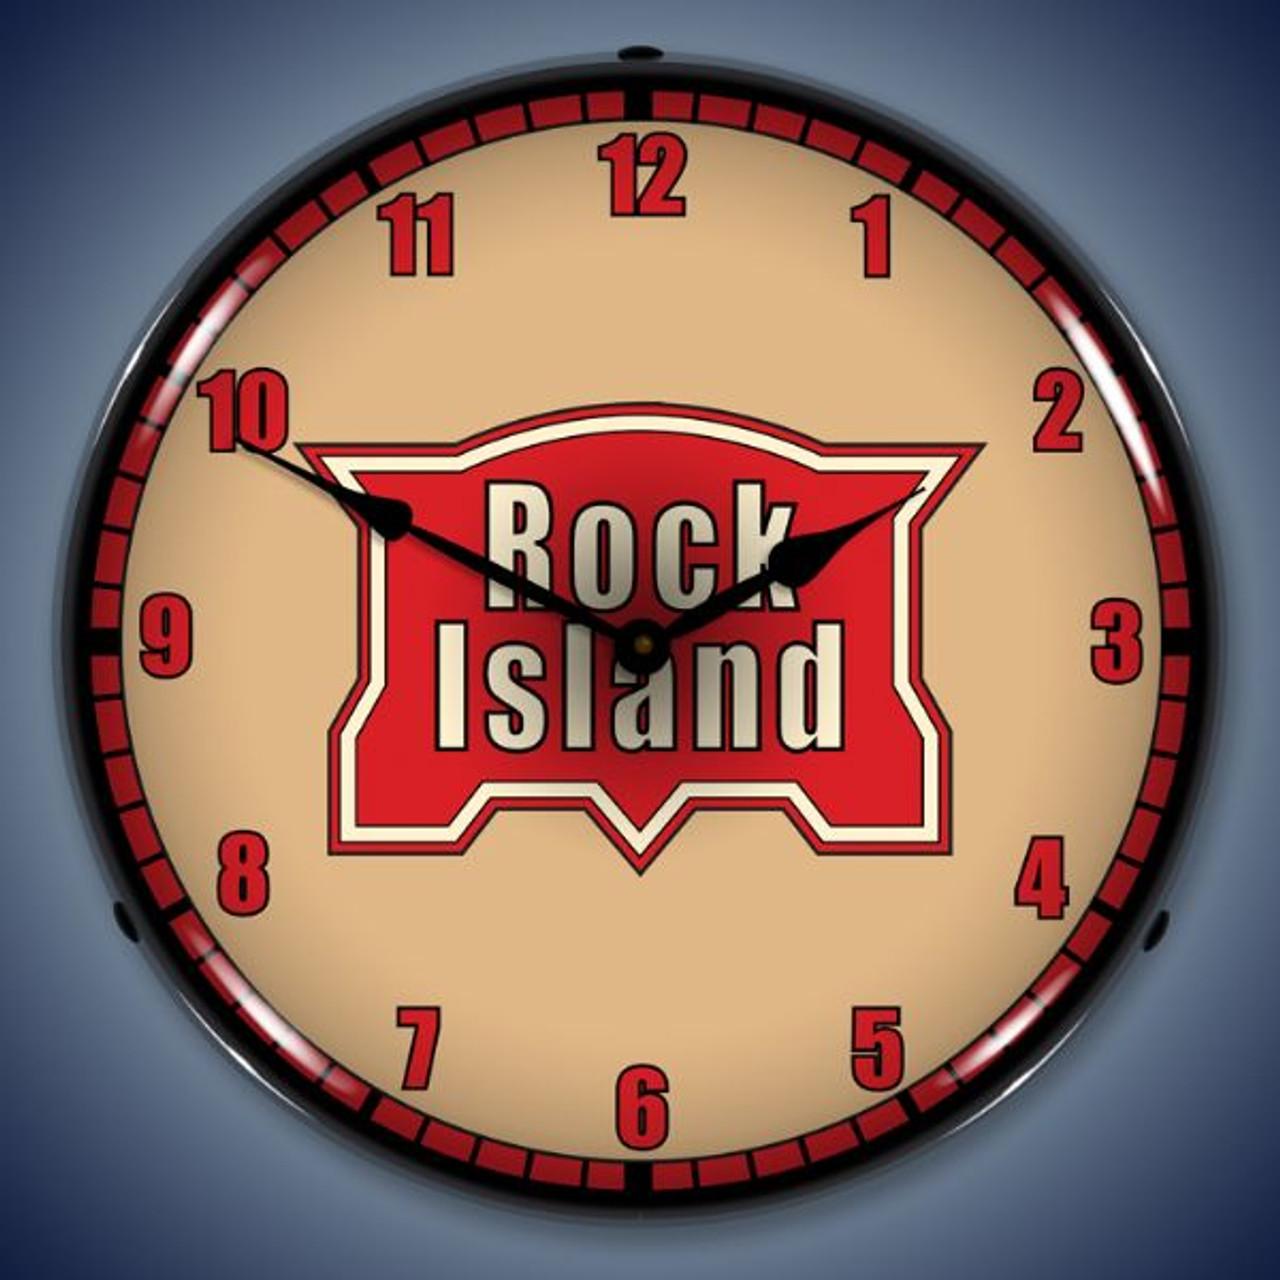 Retro  Rock Island Railroad Lighted Wall Clock 14 x 14 Inches